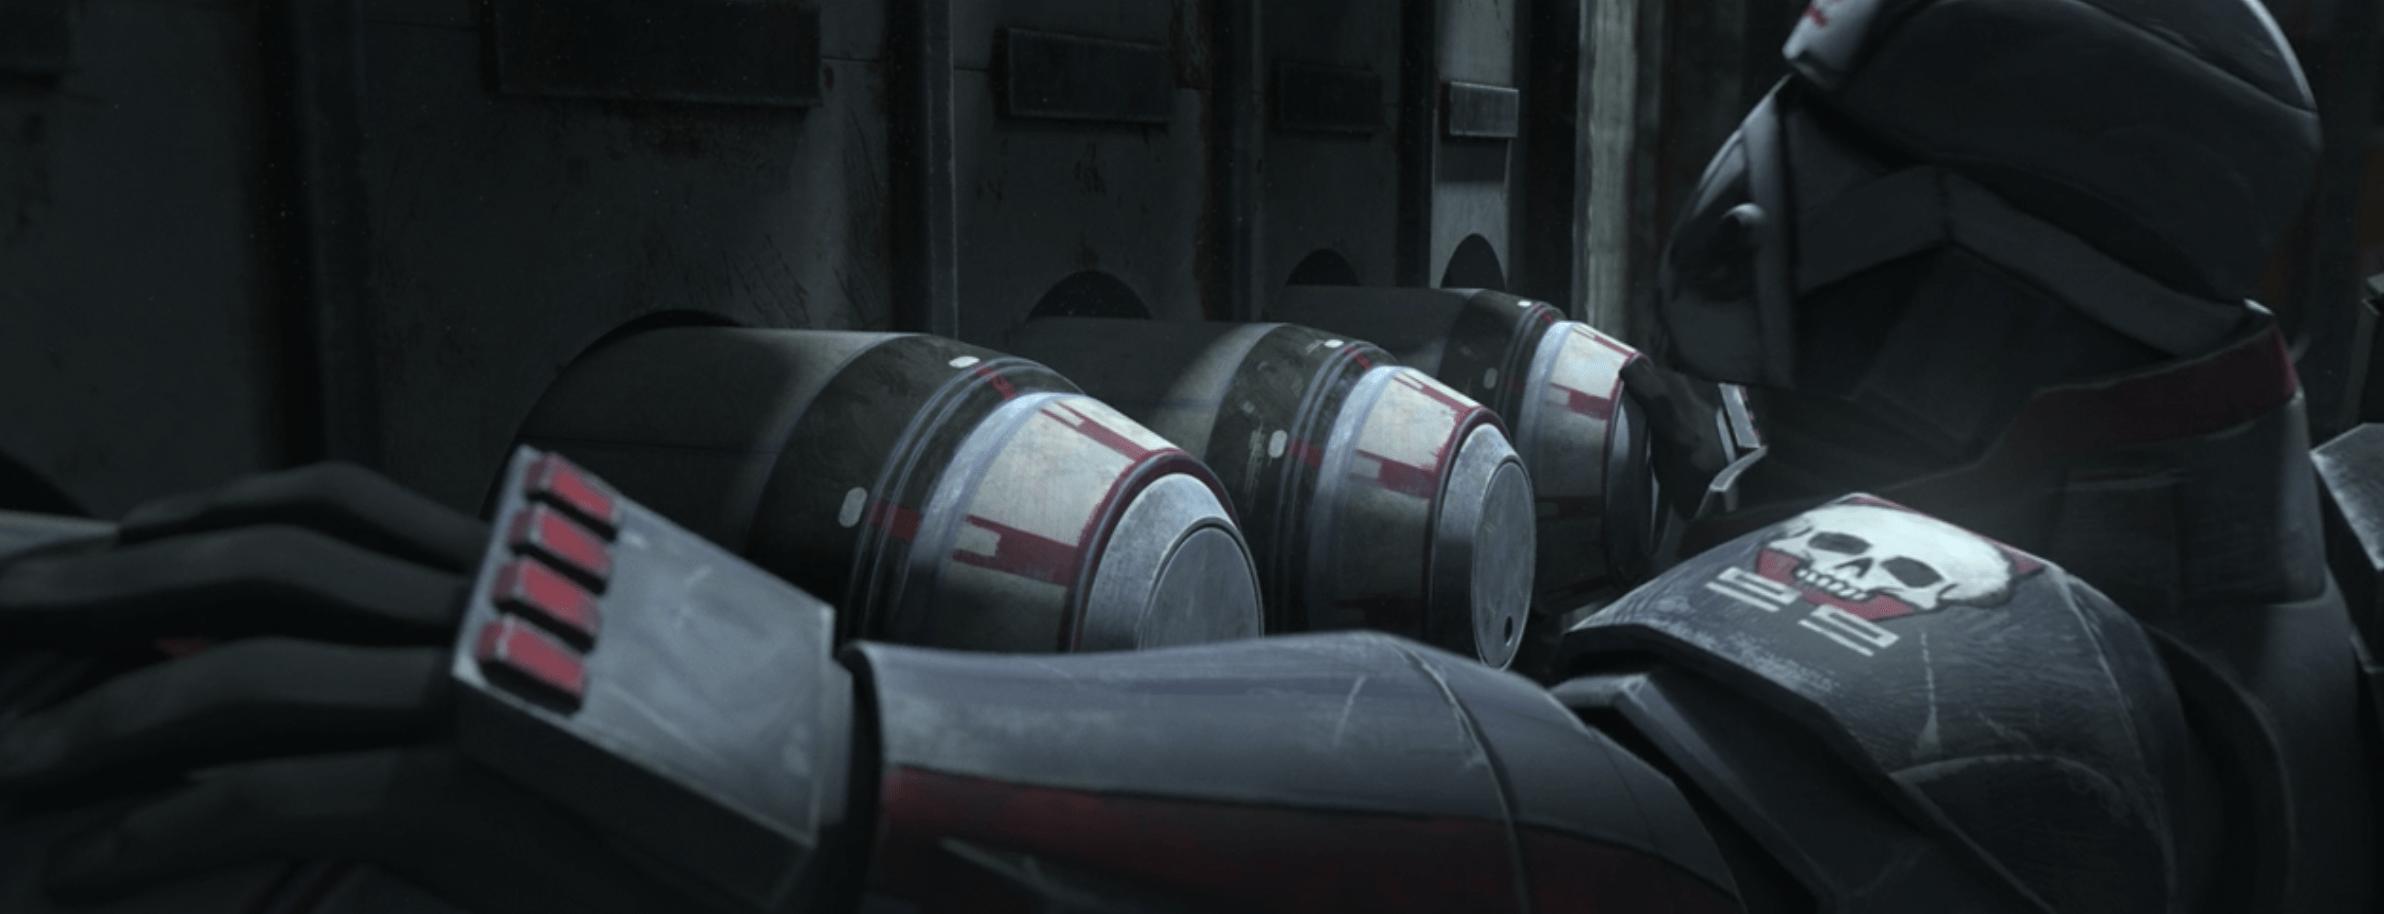 bad batch episode 8 breakdown proton torpedoes